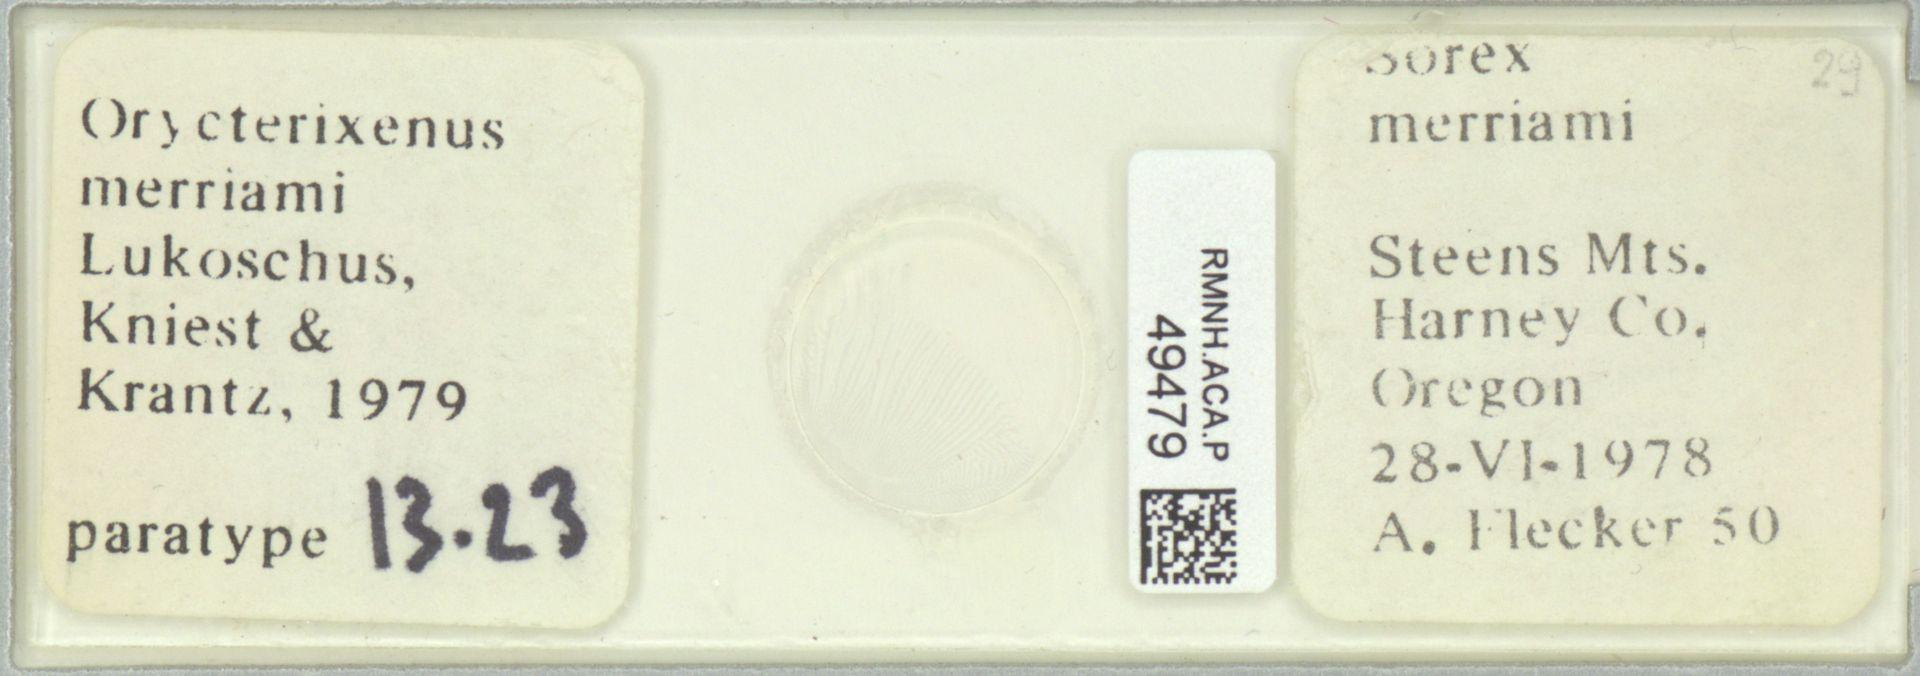 RMNH.ACA.P.49479 | Orycterixenus merriami Lukoschus, Kniest & Krantz, 1979